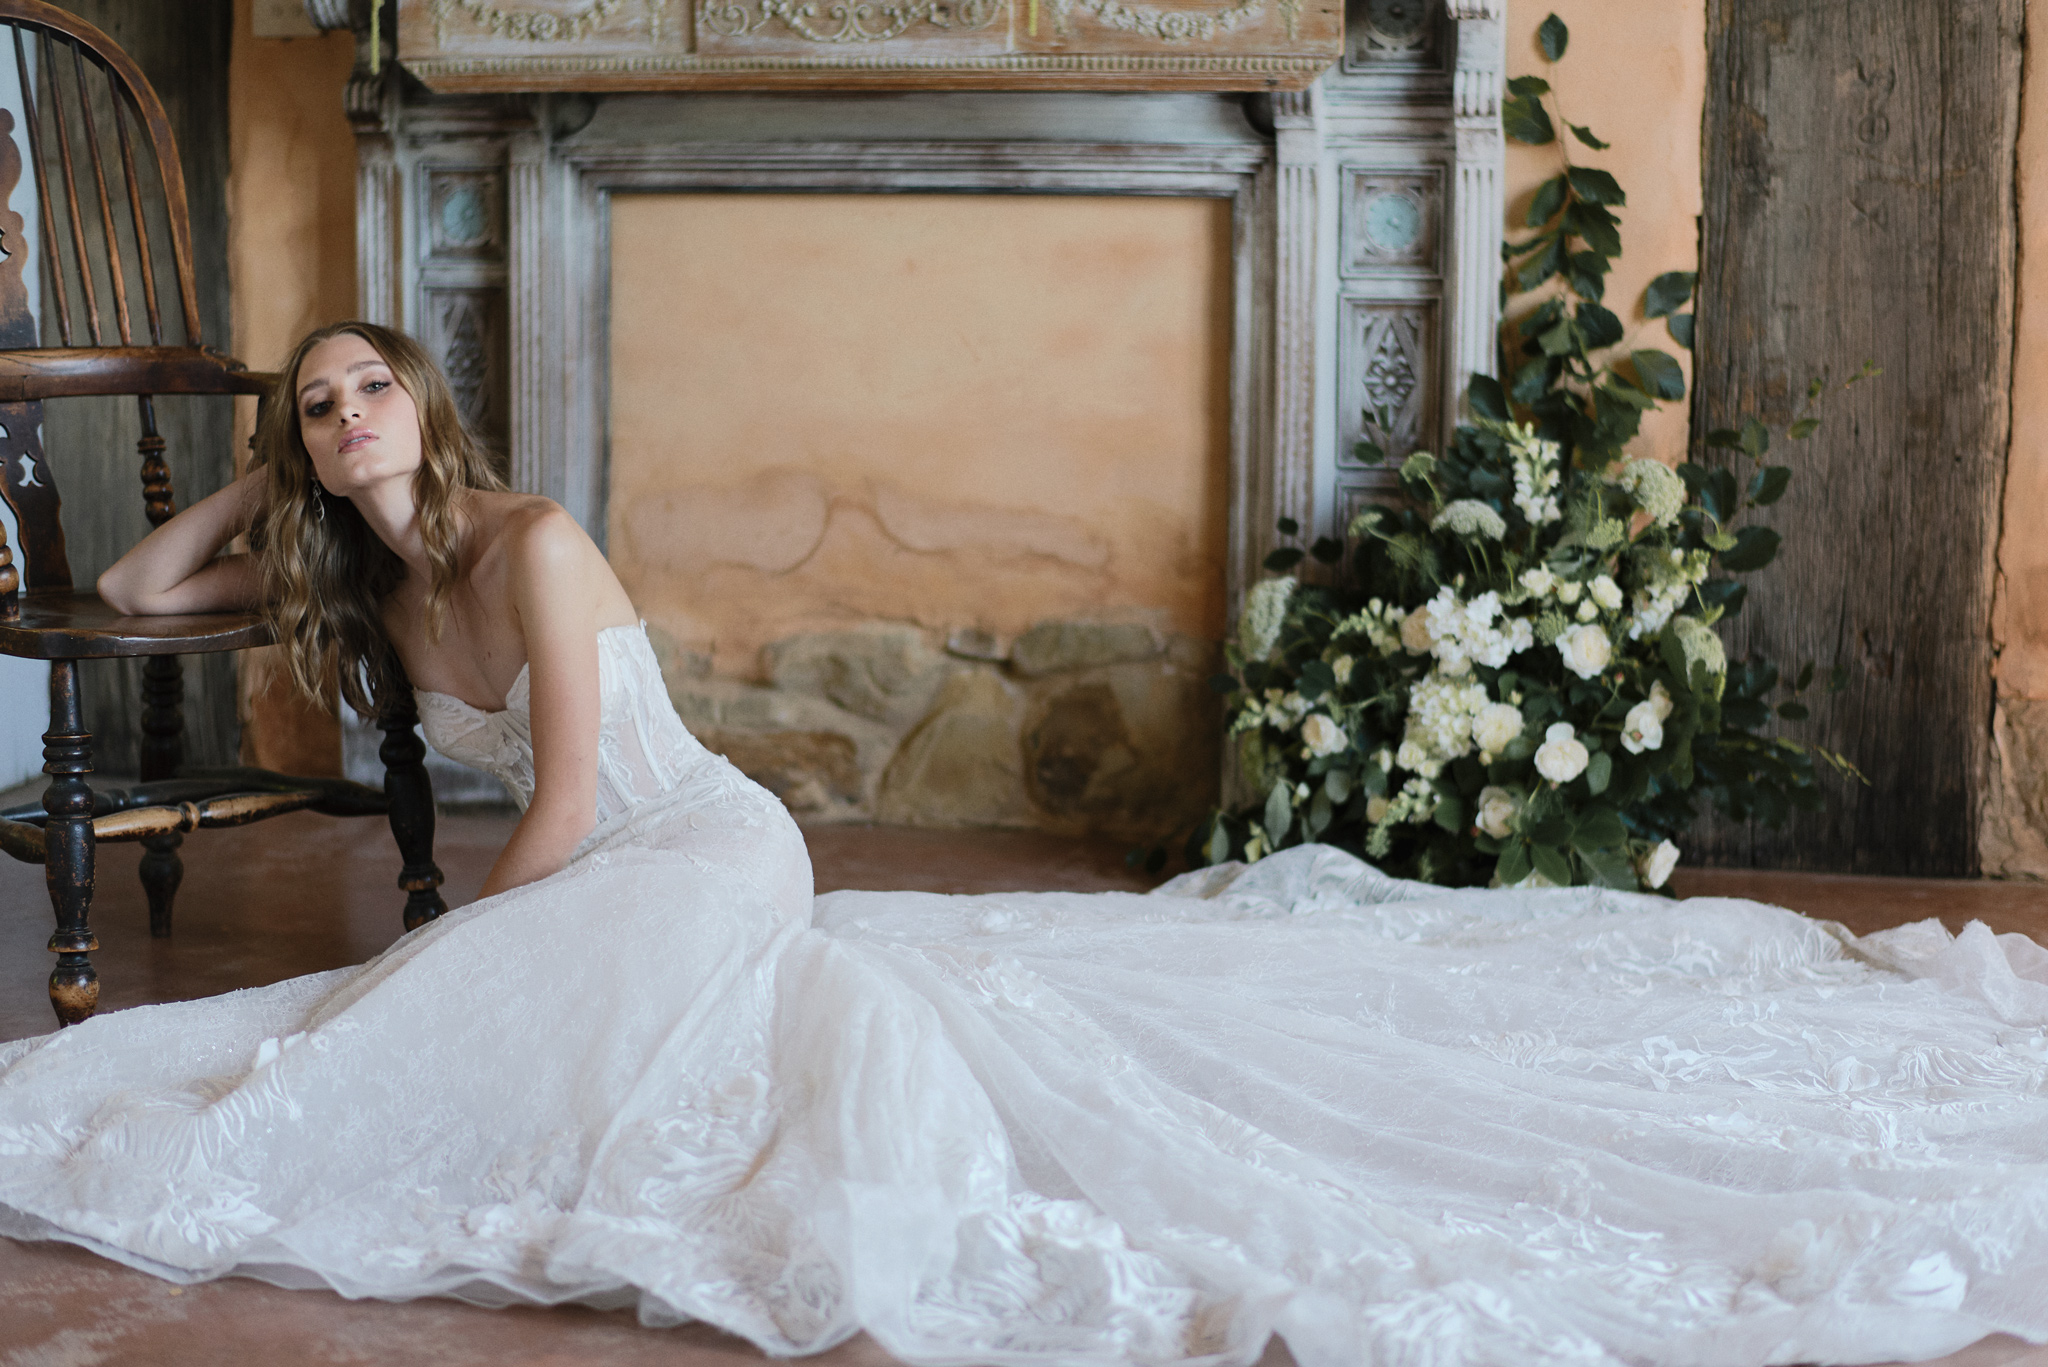 Sephory Photography - Romance is not dead 108 - Web.jpg